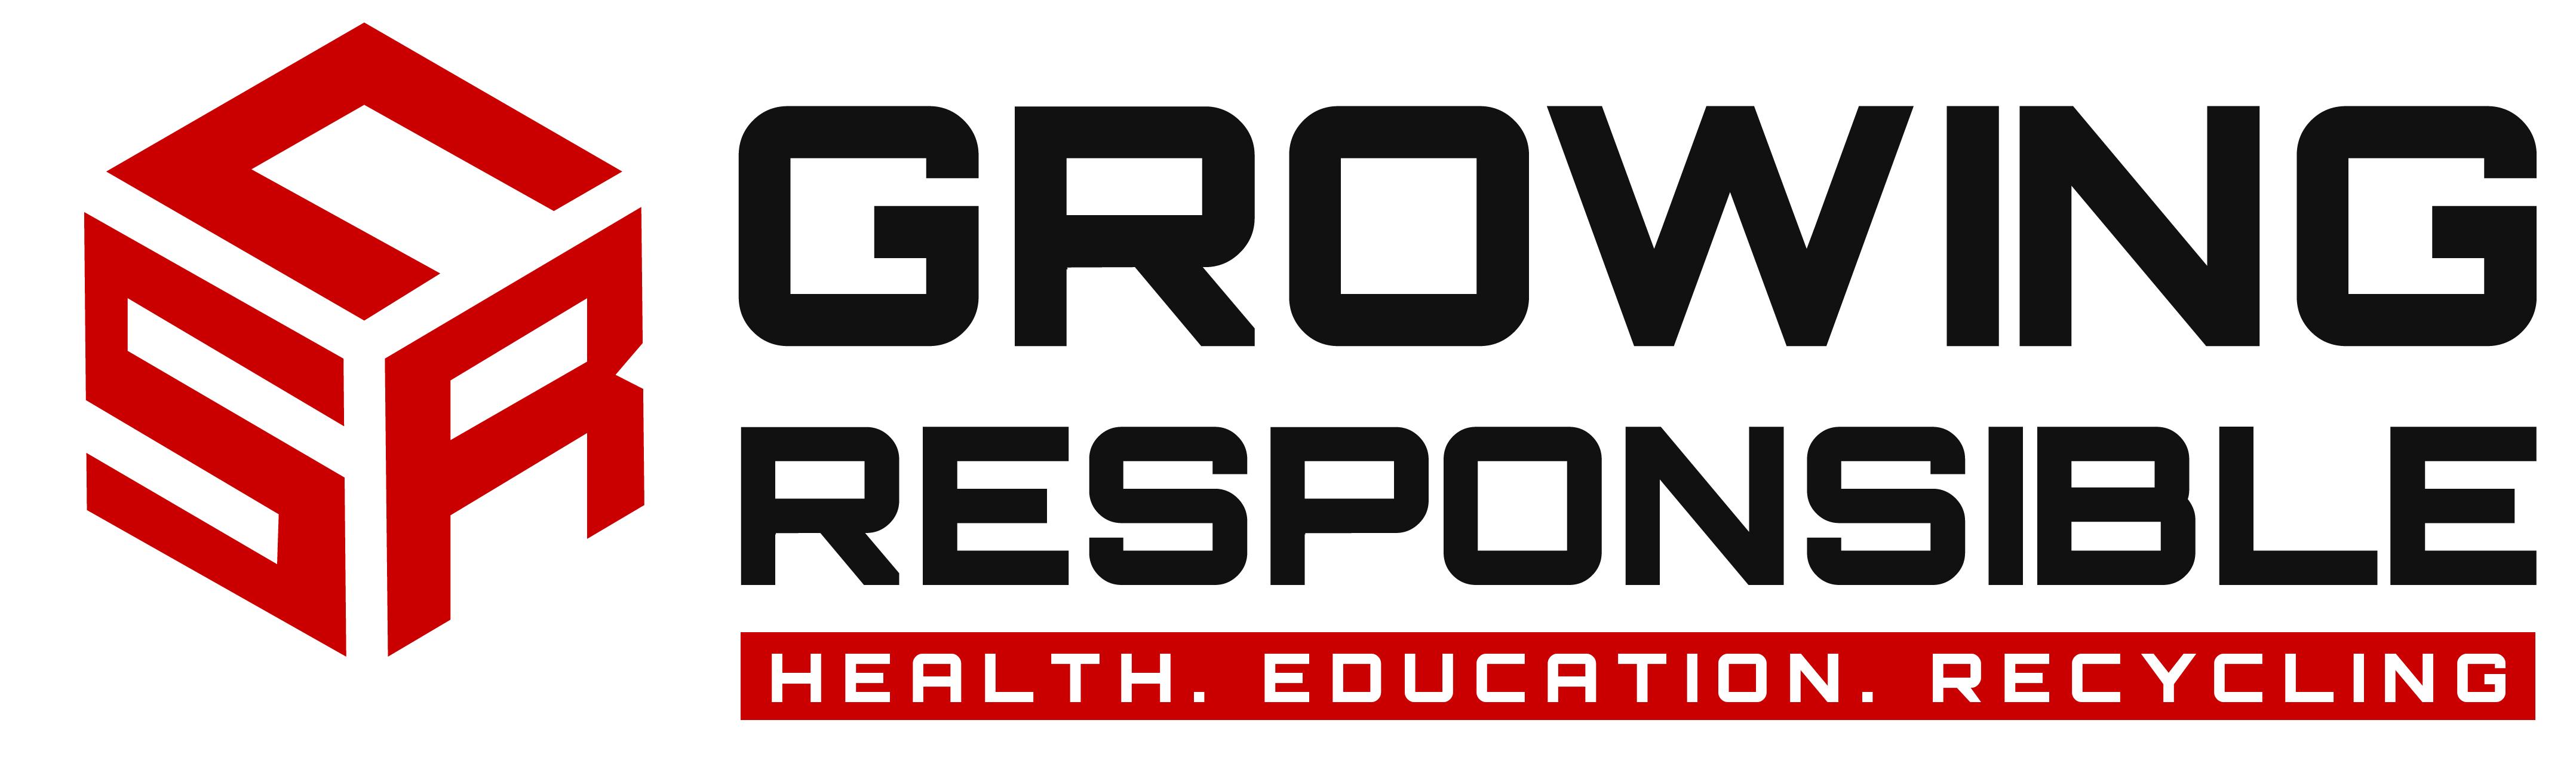 Conferința CSR – Growing Responsible